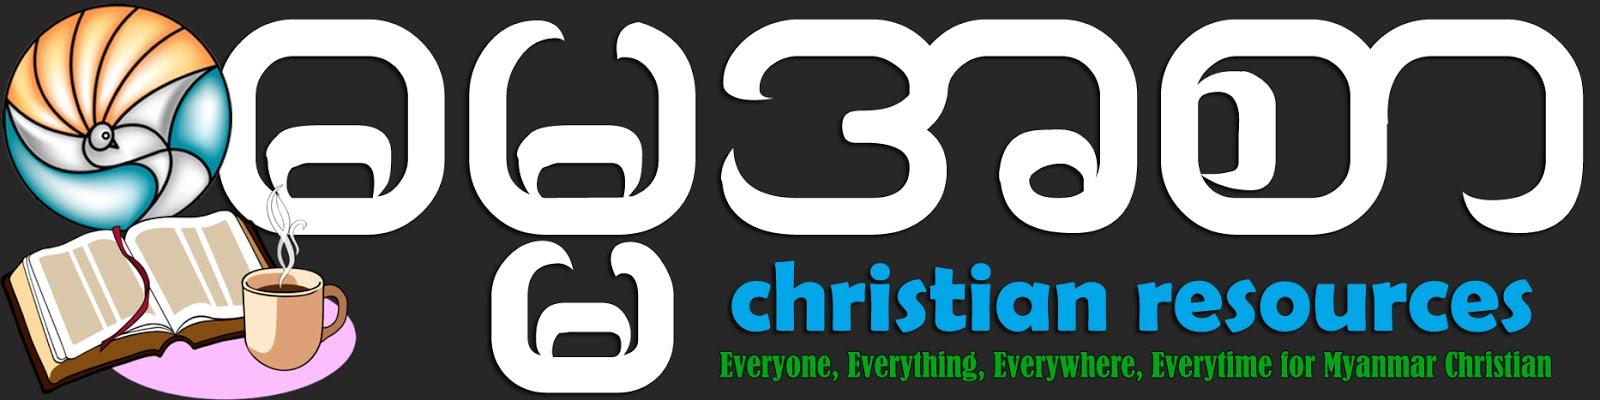 Myanmar Gospel Songs Selection Download MP3 | Damahahsar Christian